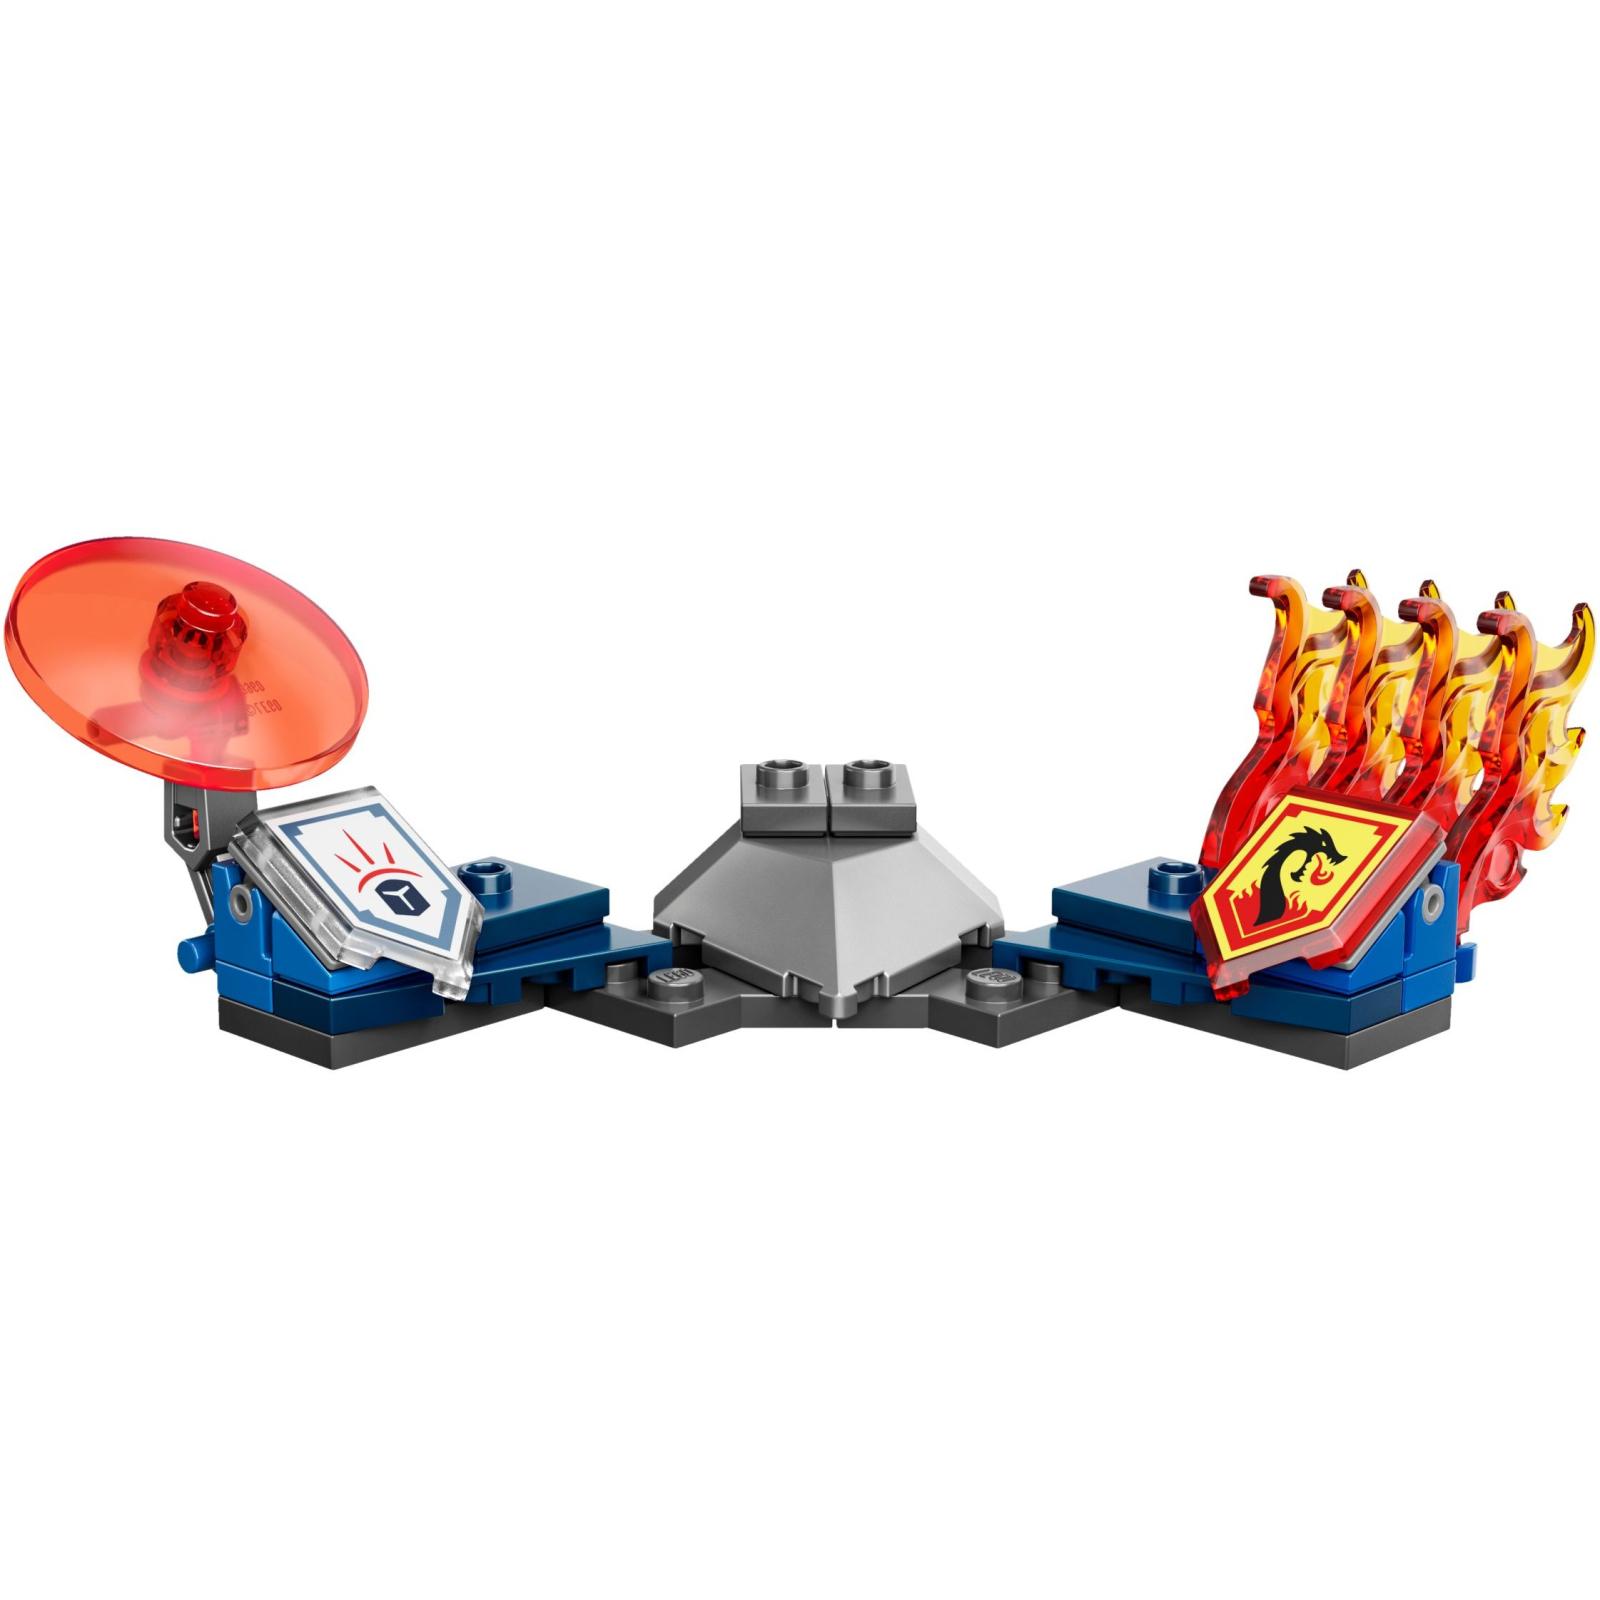 Конструктор LEGO Nexo Knights Клэй Абсолютная сила (70330) изображение 4